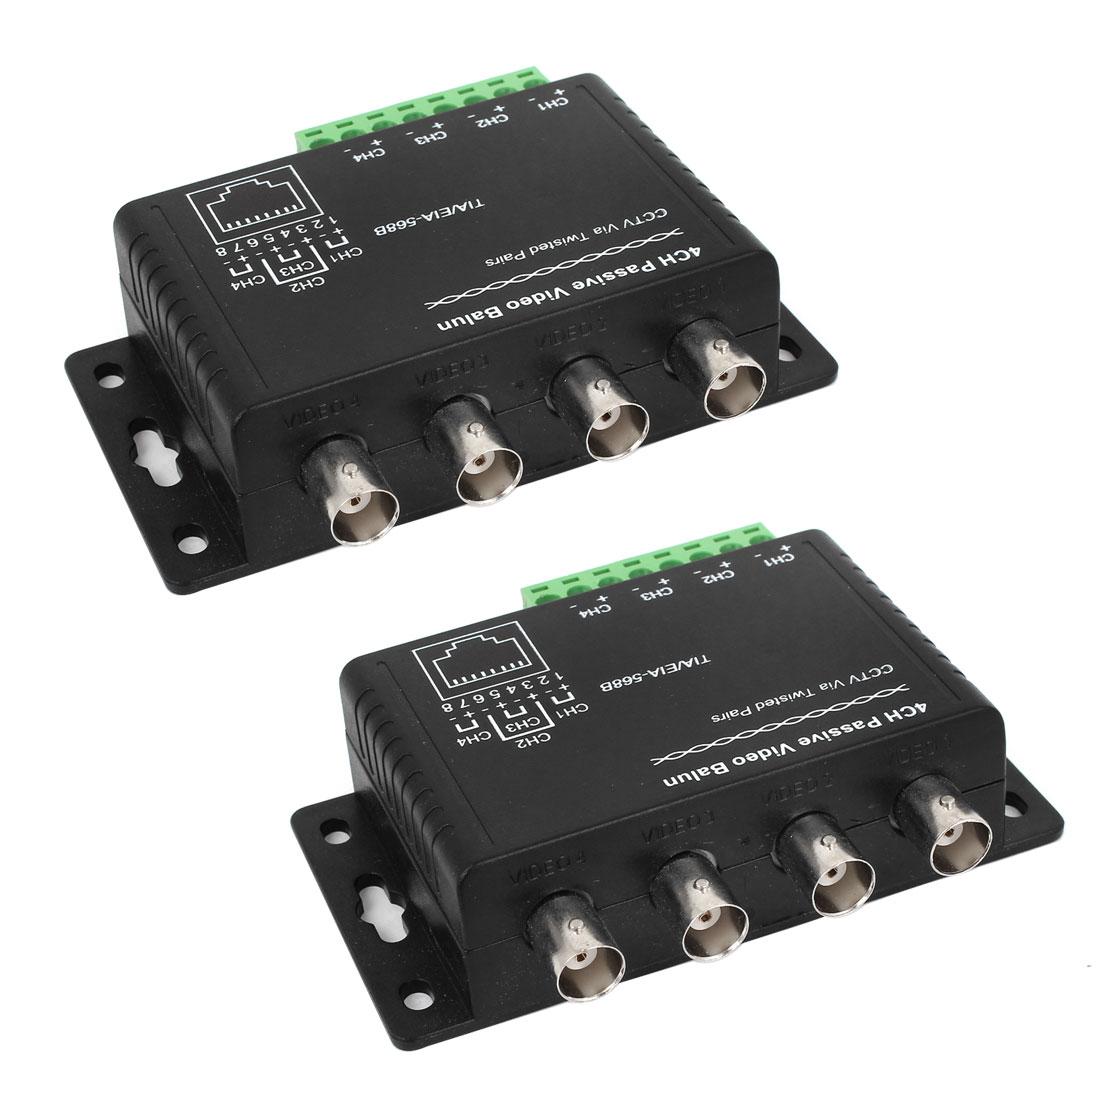 2pcs CCTV RJ45 4 BNC 4Ch Passive Receiver Transmitter UTP Video Balun Black